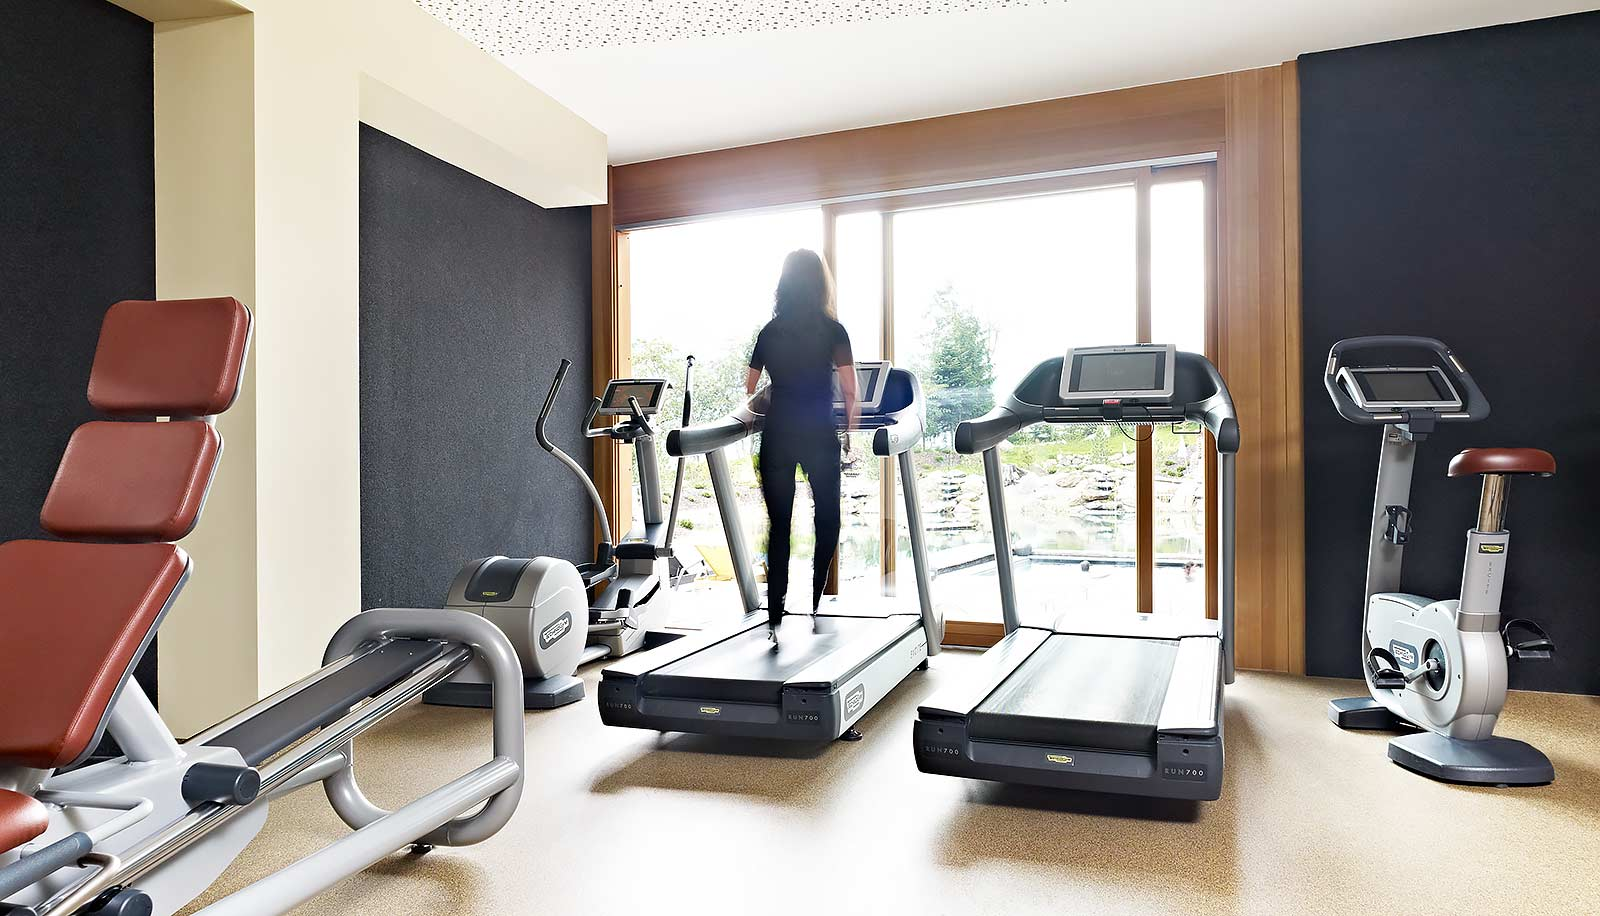 Bio wellnesshotel im ultental bei meran arosea life balance for Designhotel ultental